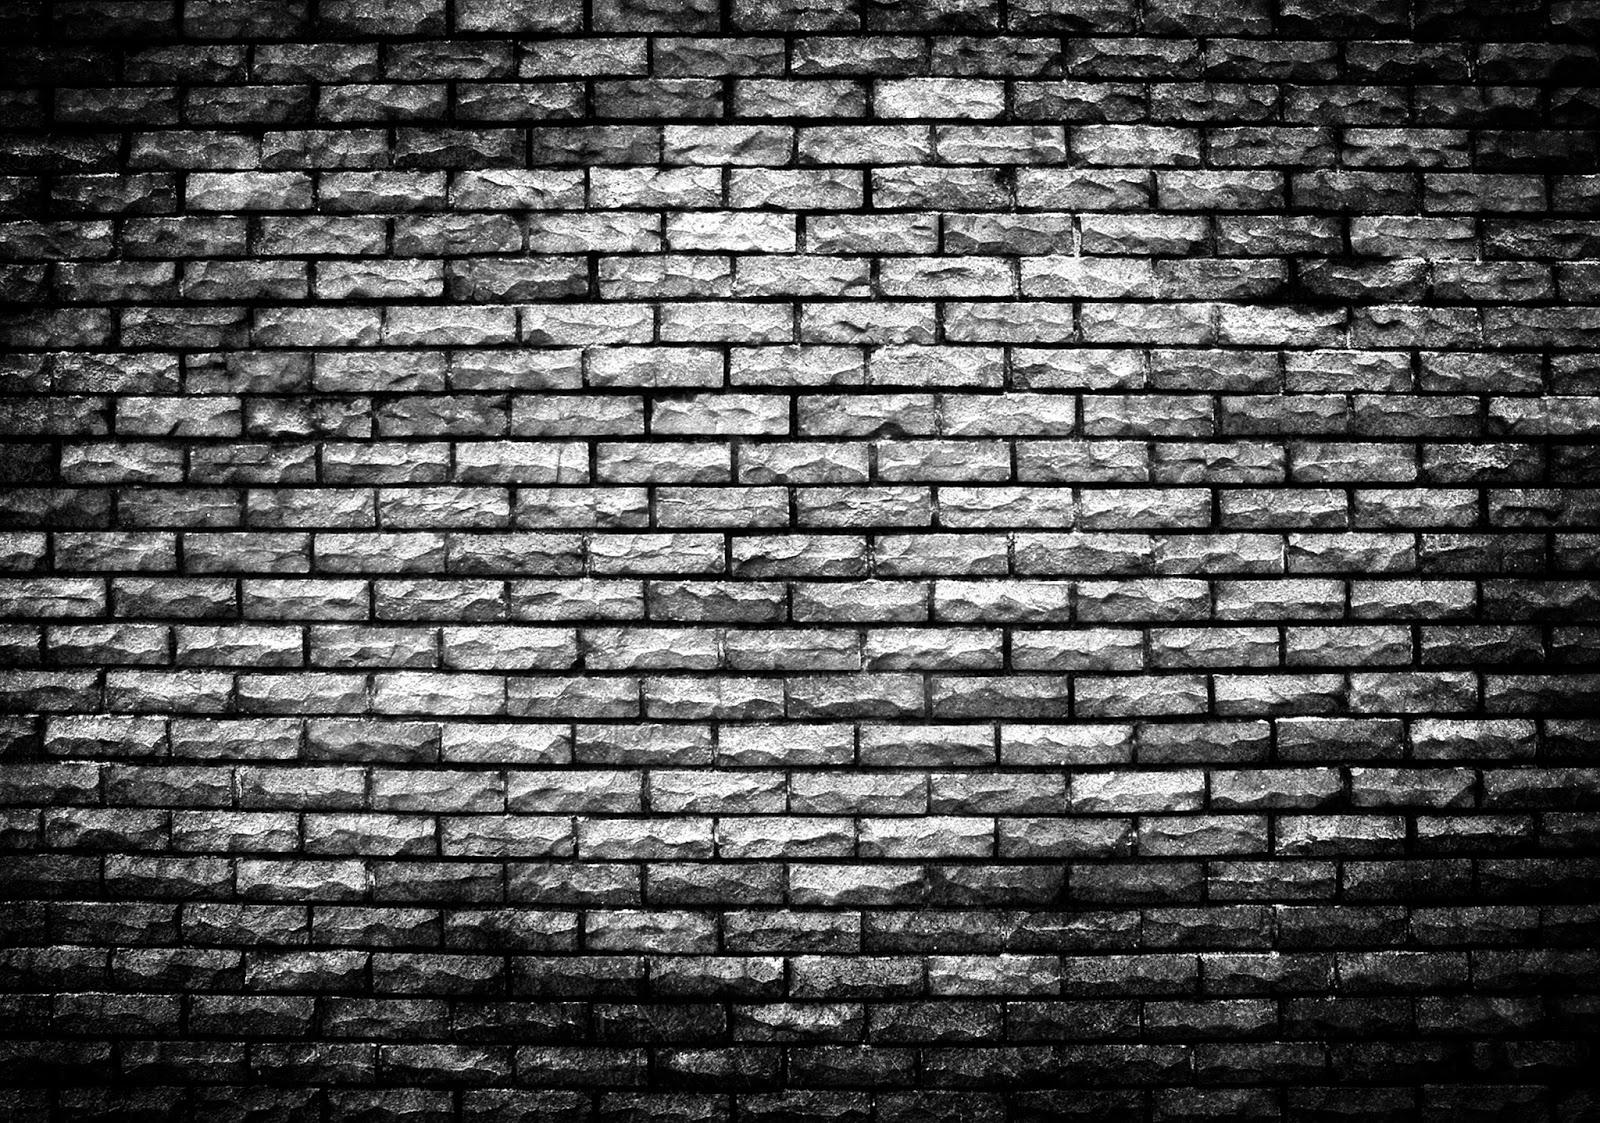 black brick wall texture rrraw picasso punk